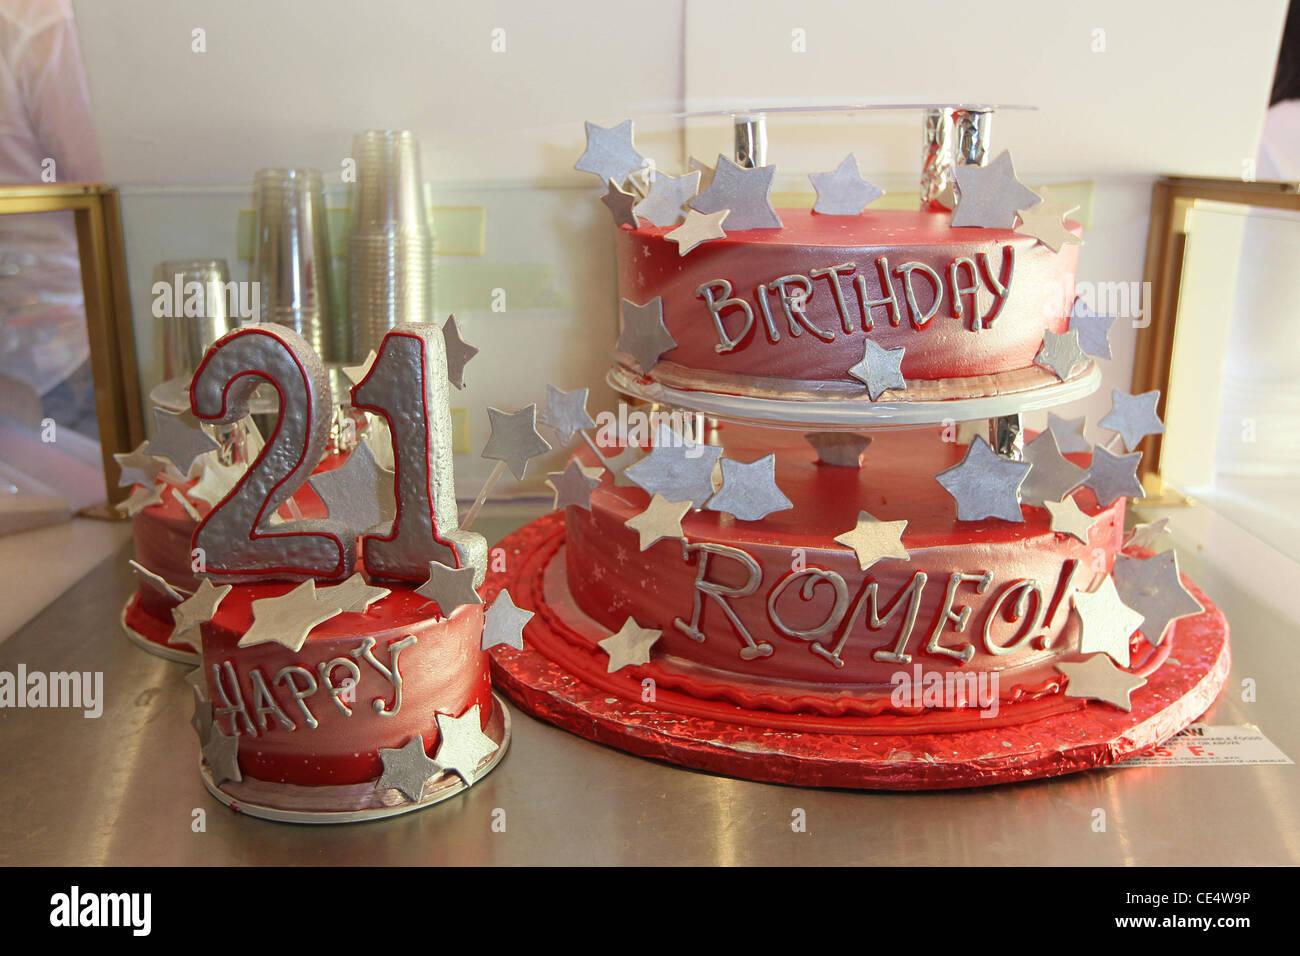 Jr Cake Romeo Celebrates His 21st Birthday By Creating A Custom Shake At Millions Of Milkshakes In West Hollywood Los Angeles California